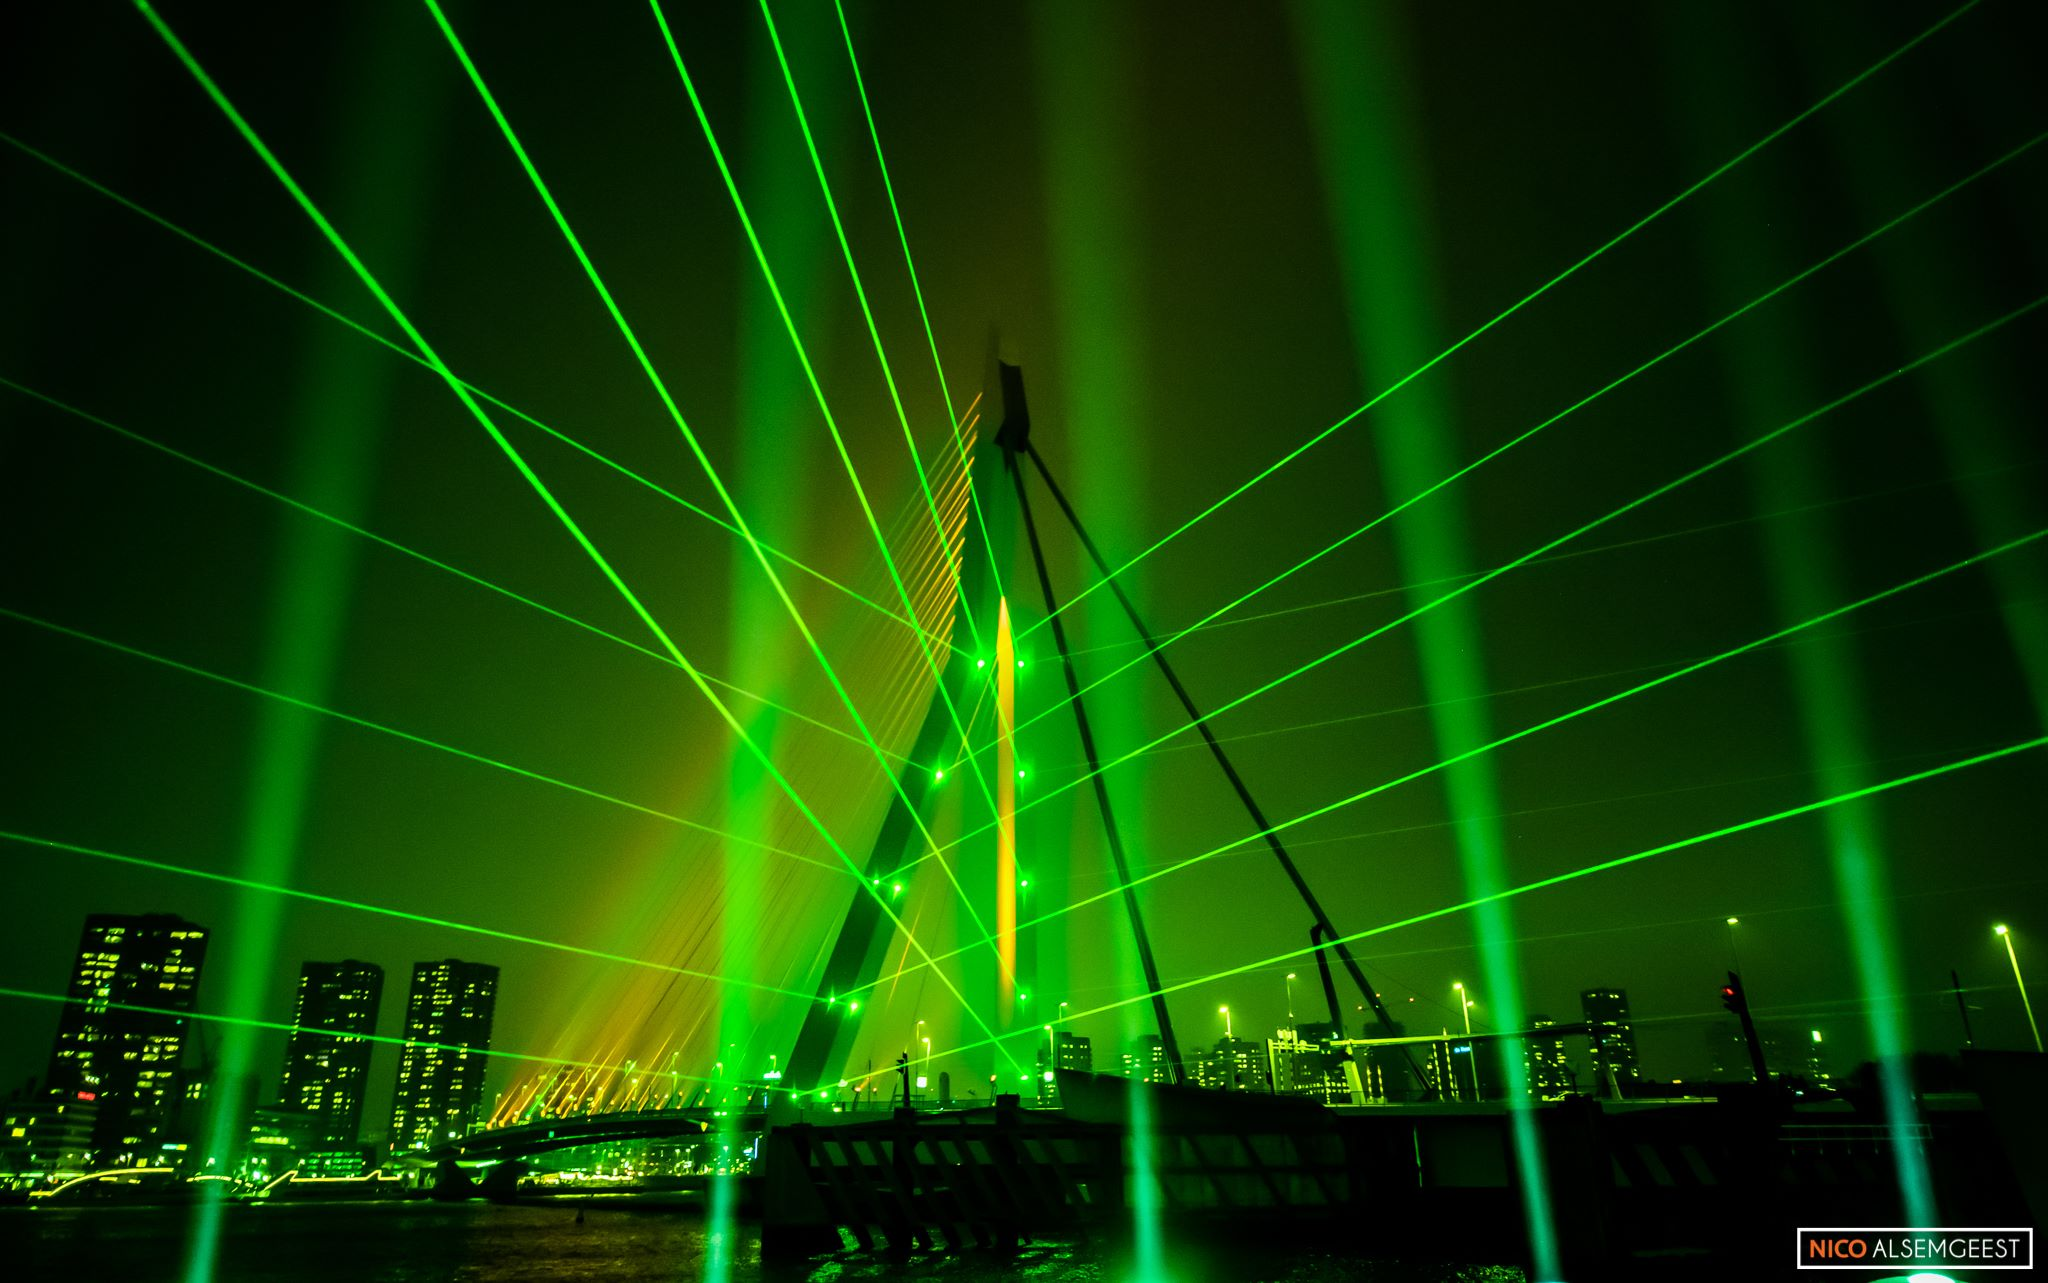 kpn openingshow rotterdam erasmusbridge lasers